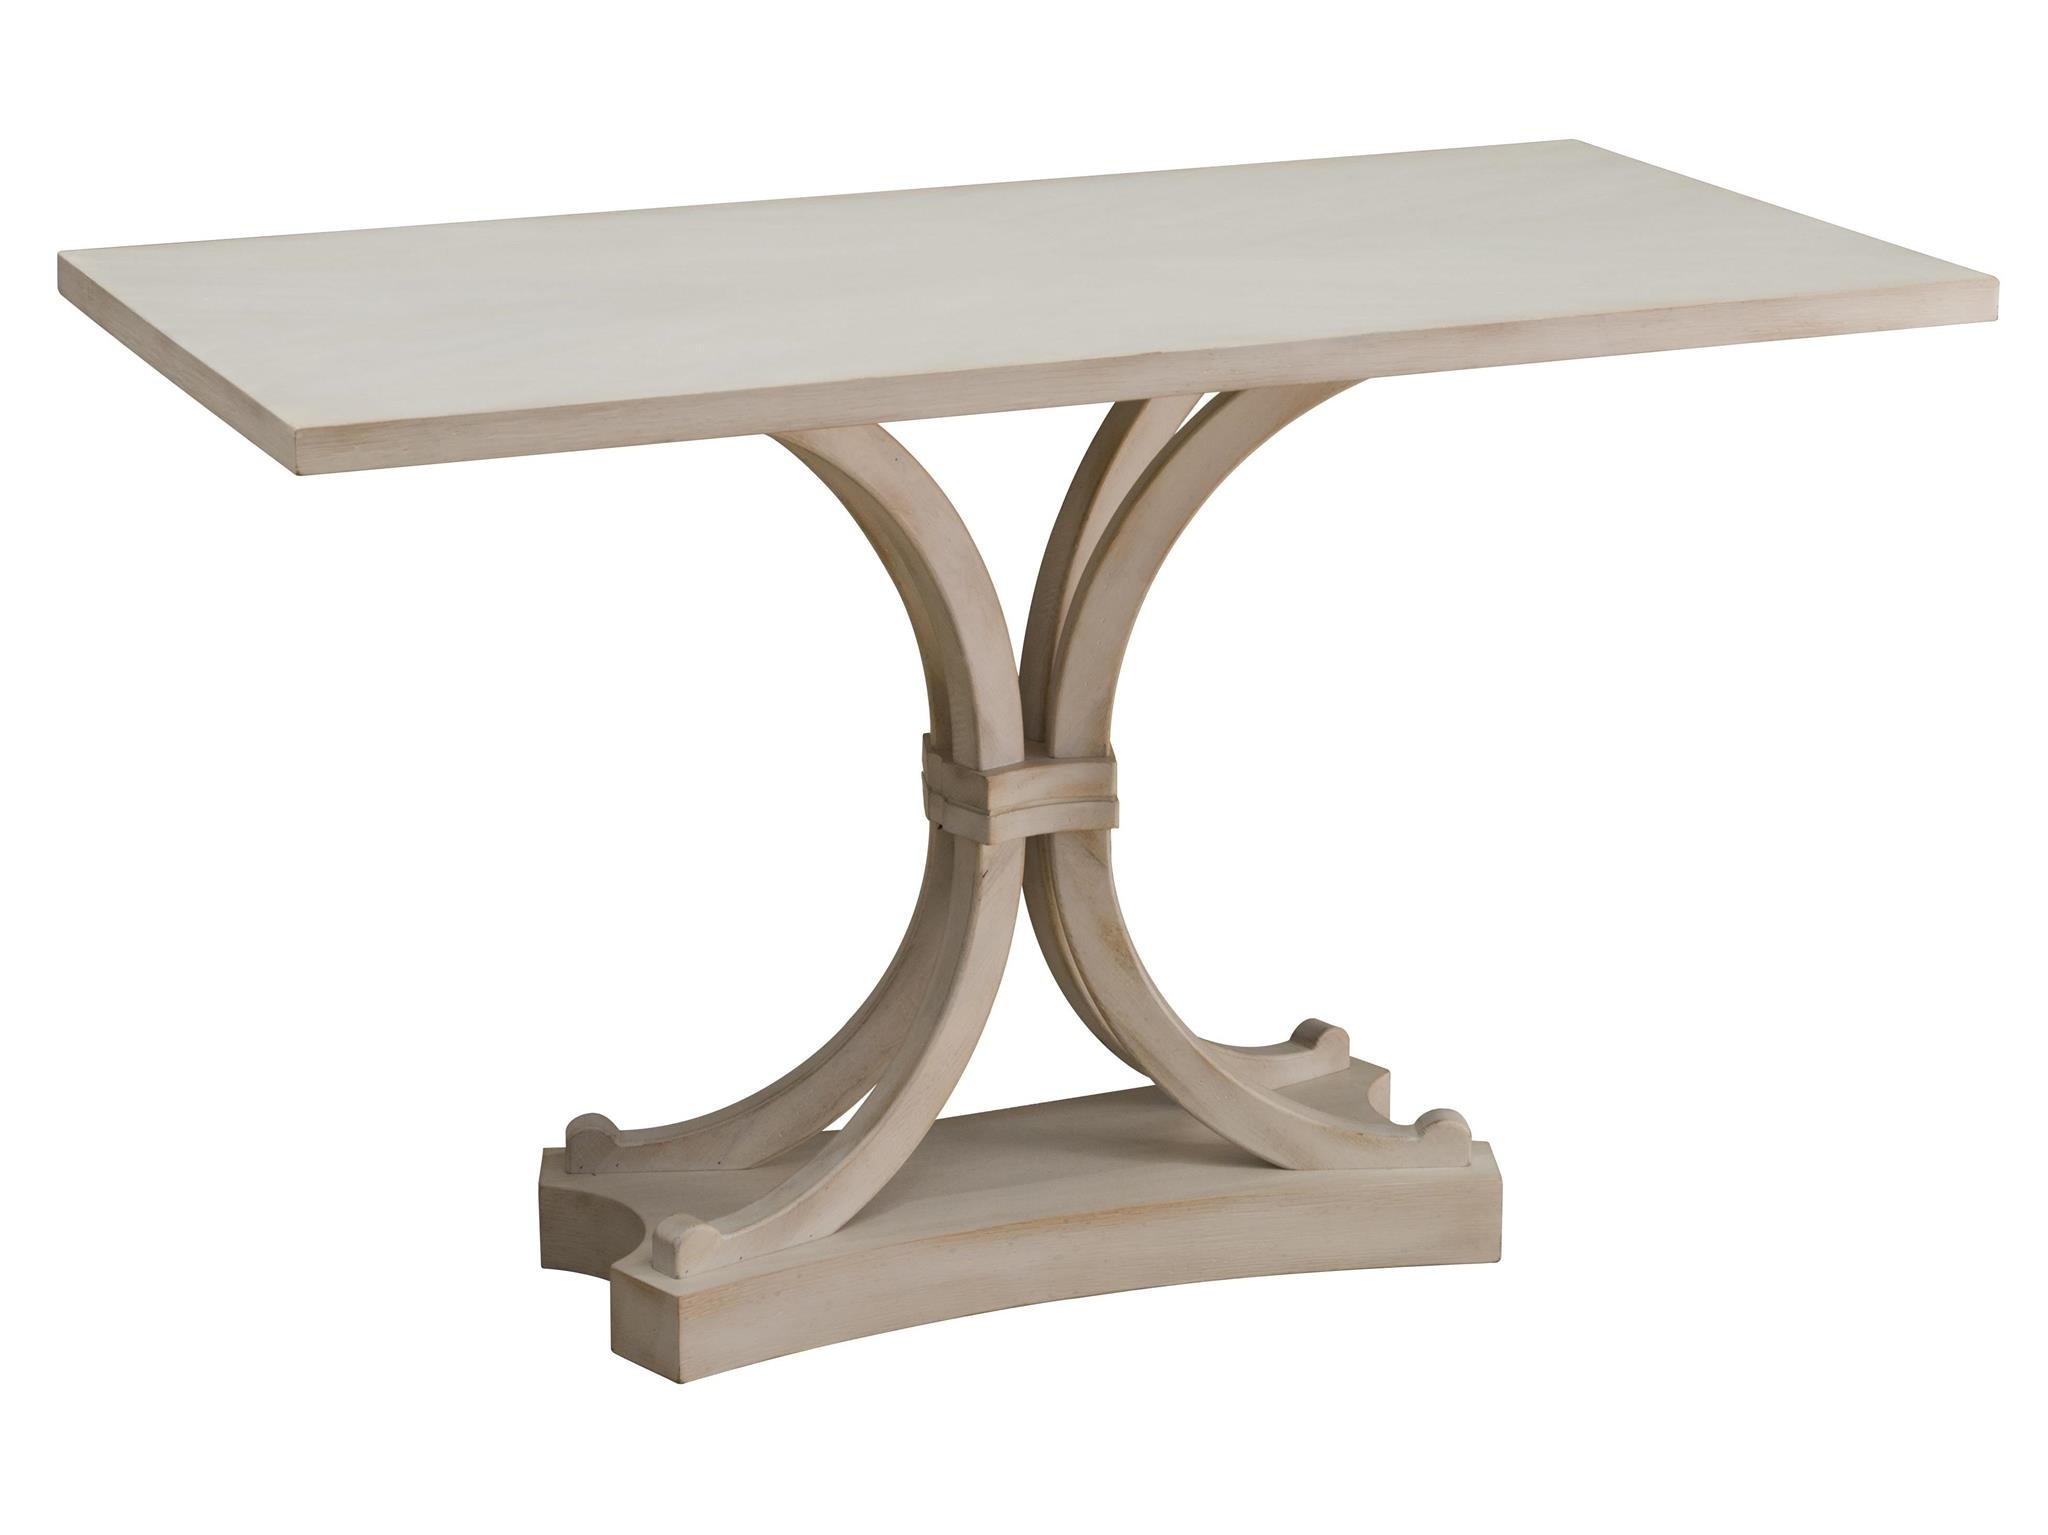 Fine Furniture Design Living Room Nicole Console Table Top 1581 948    Bartlett Home Furnishings   Memphis, TN